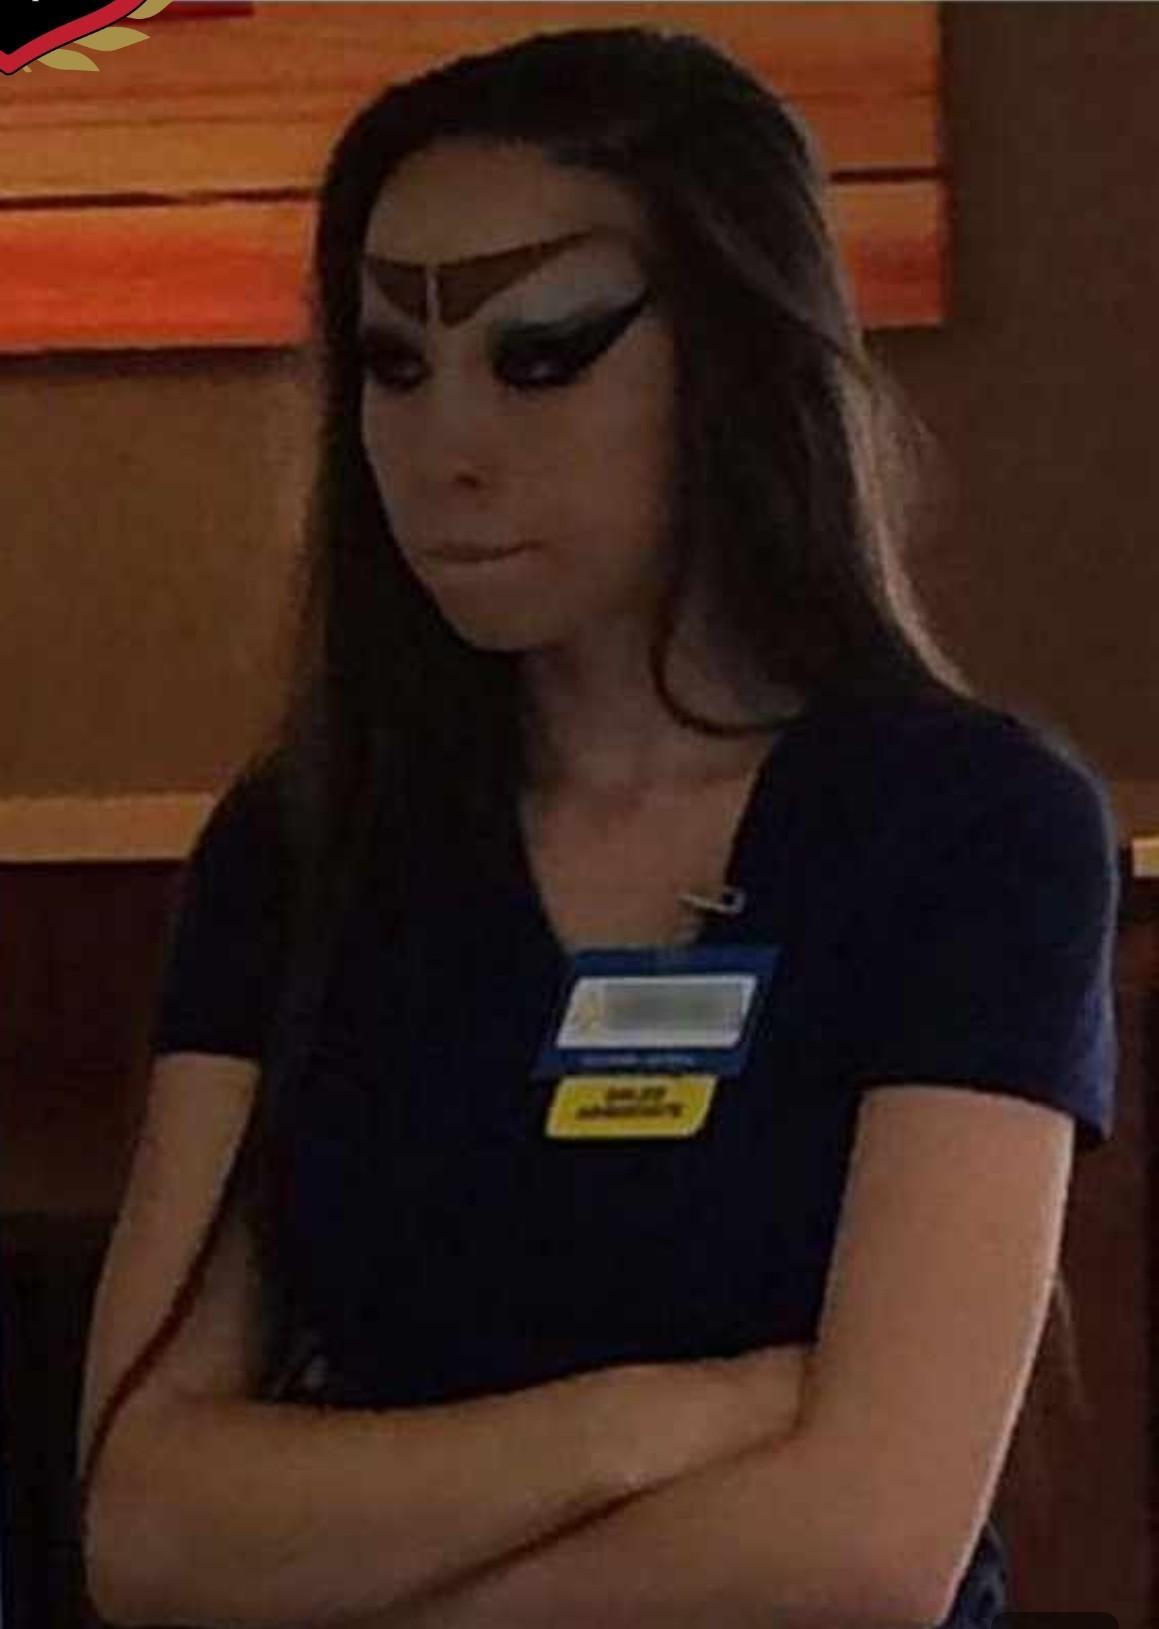 Walmart Eyebrows : walmart, eyebrows, Awful, Eyebrows, Wal-Mart, Awfuleyebrows